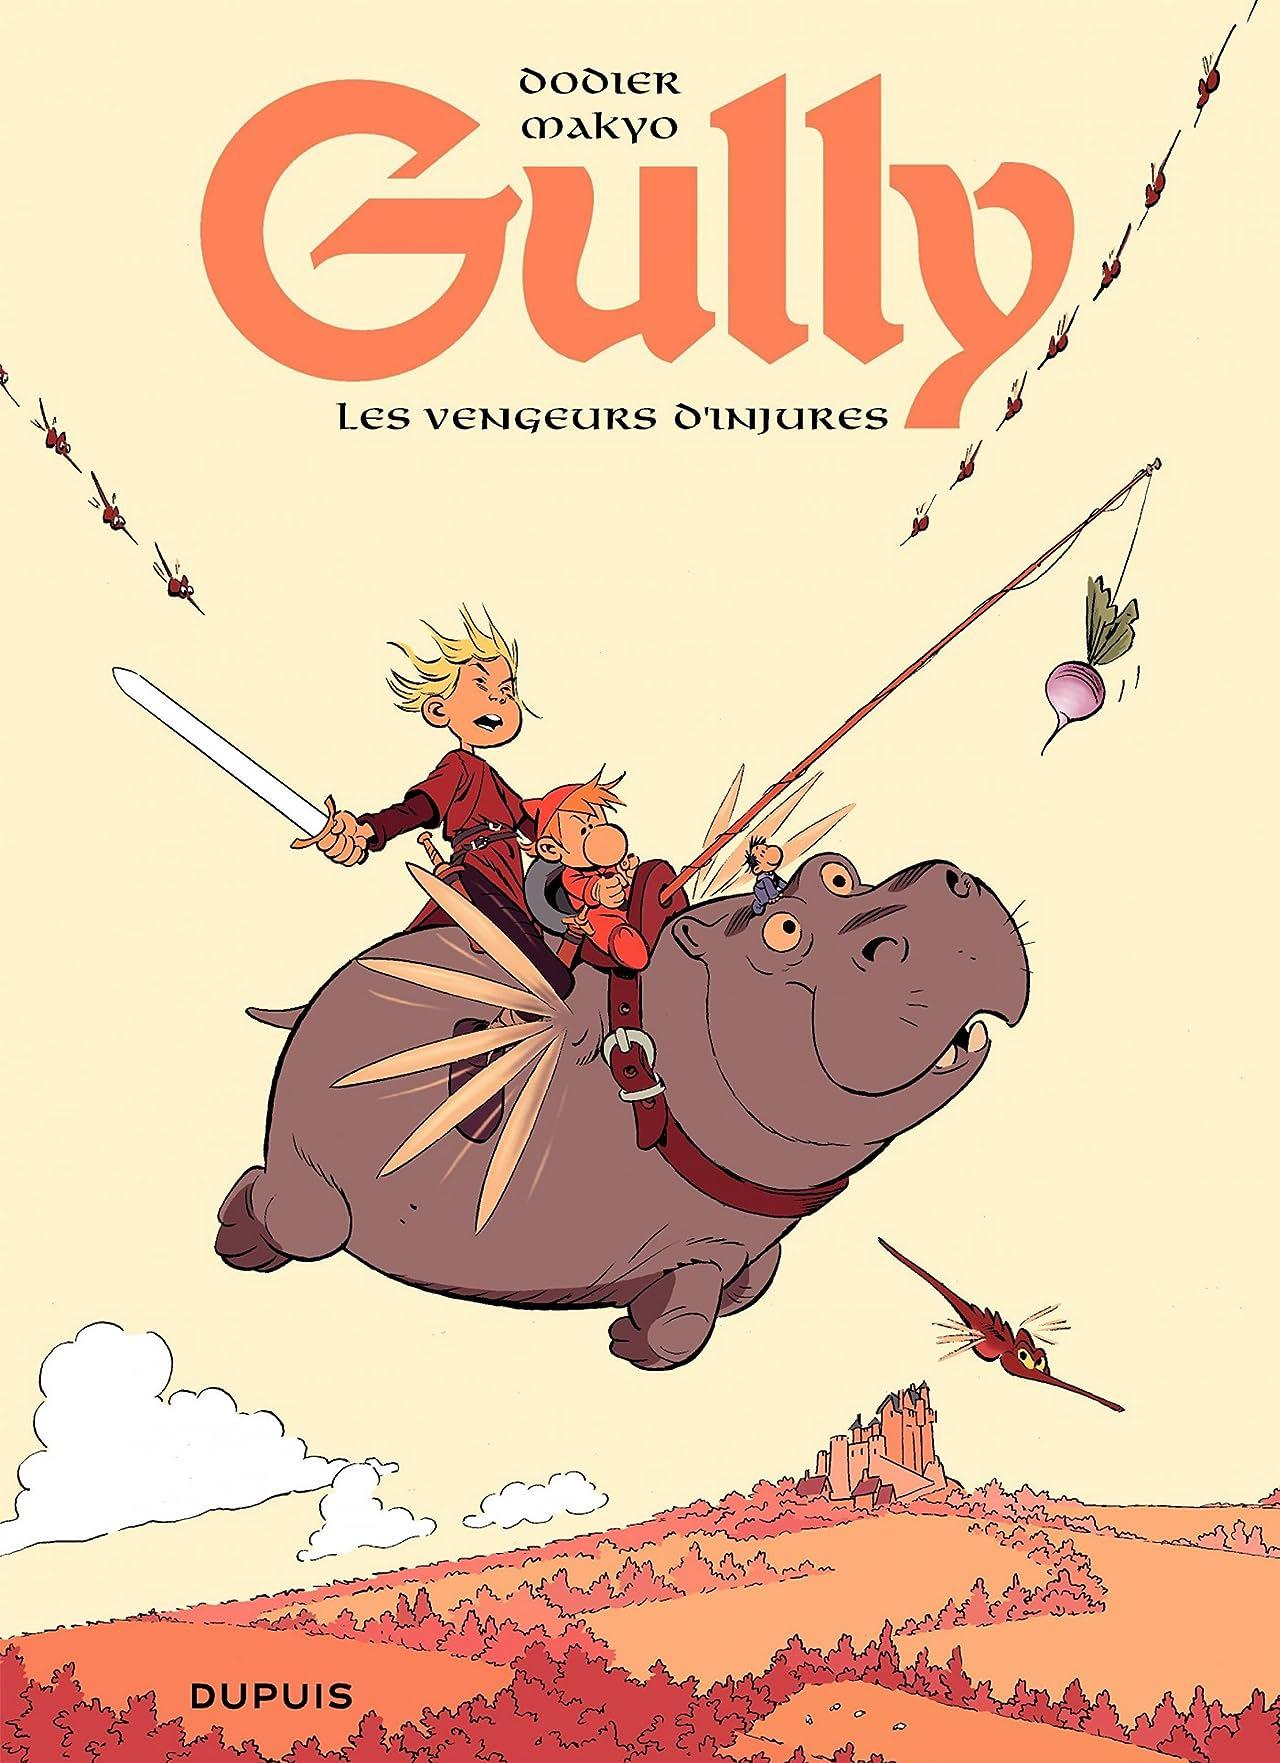 Gully Vol. 1: Les vengeurs d'injures